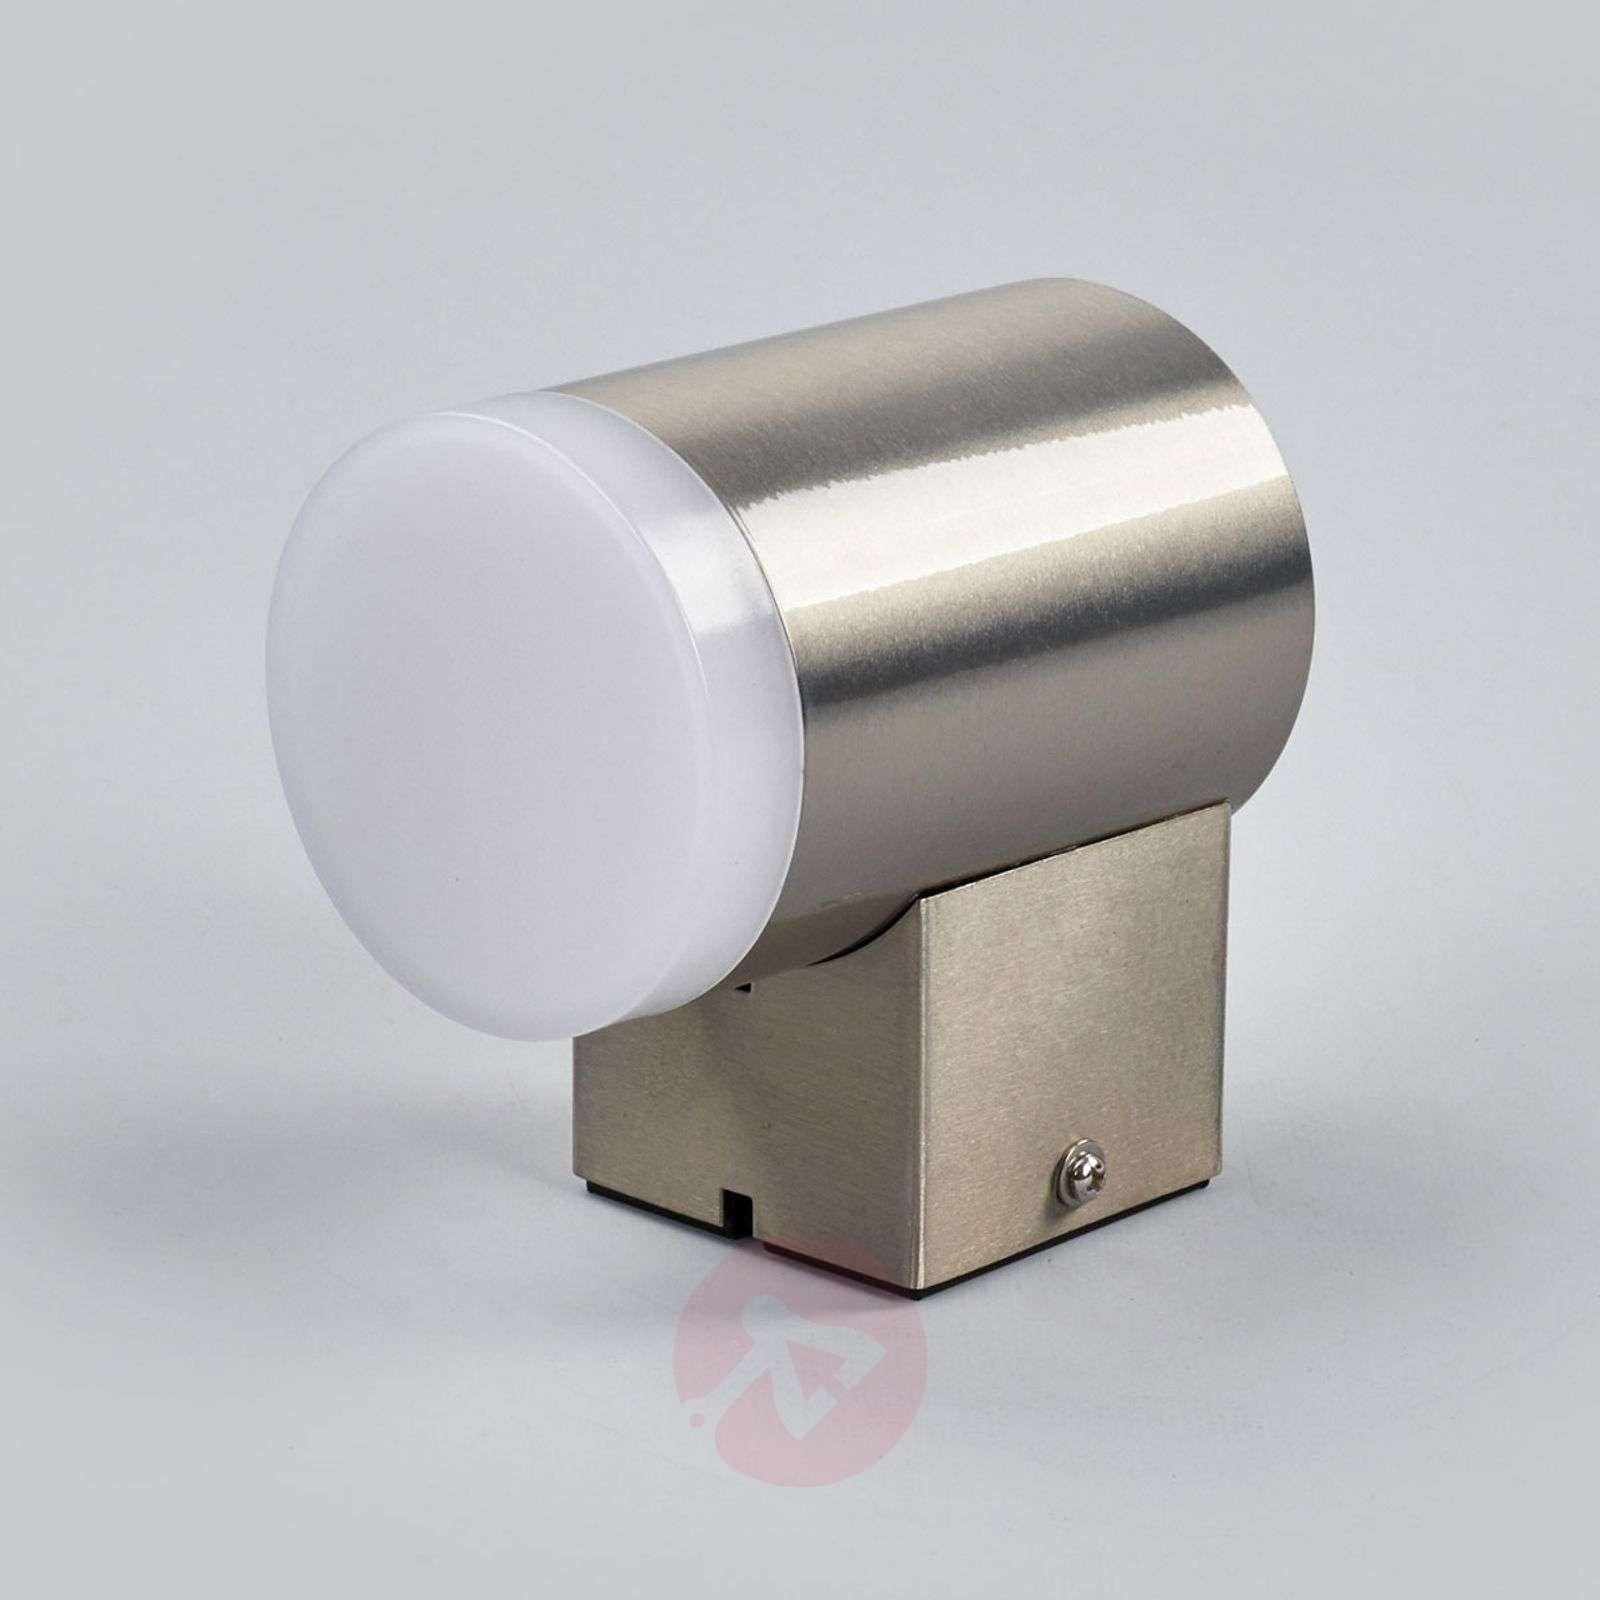 Downward facing LED outdoor wall light Eliano-9988088-03